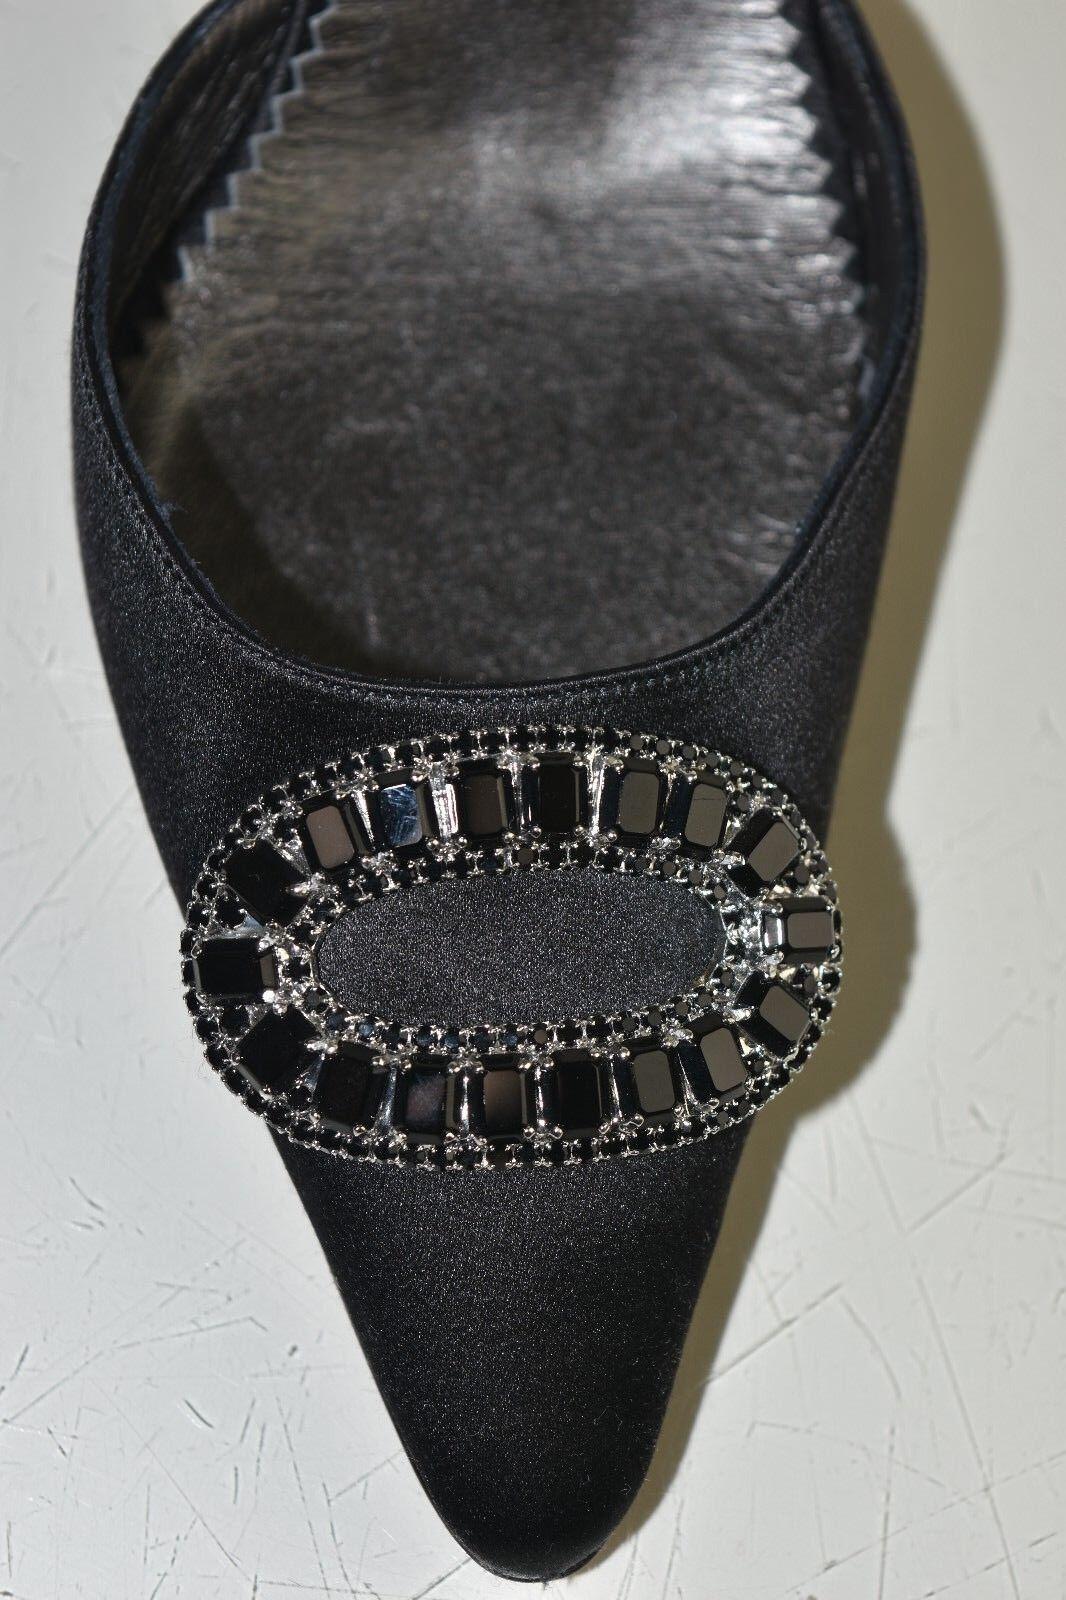 NEW Manolo Blahnik Dorsay Hangisi Black CRYSTALS Jeweled Satin Pumps Pumps Pumps shoes 40 c550ef